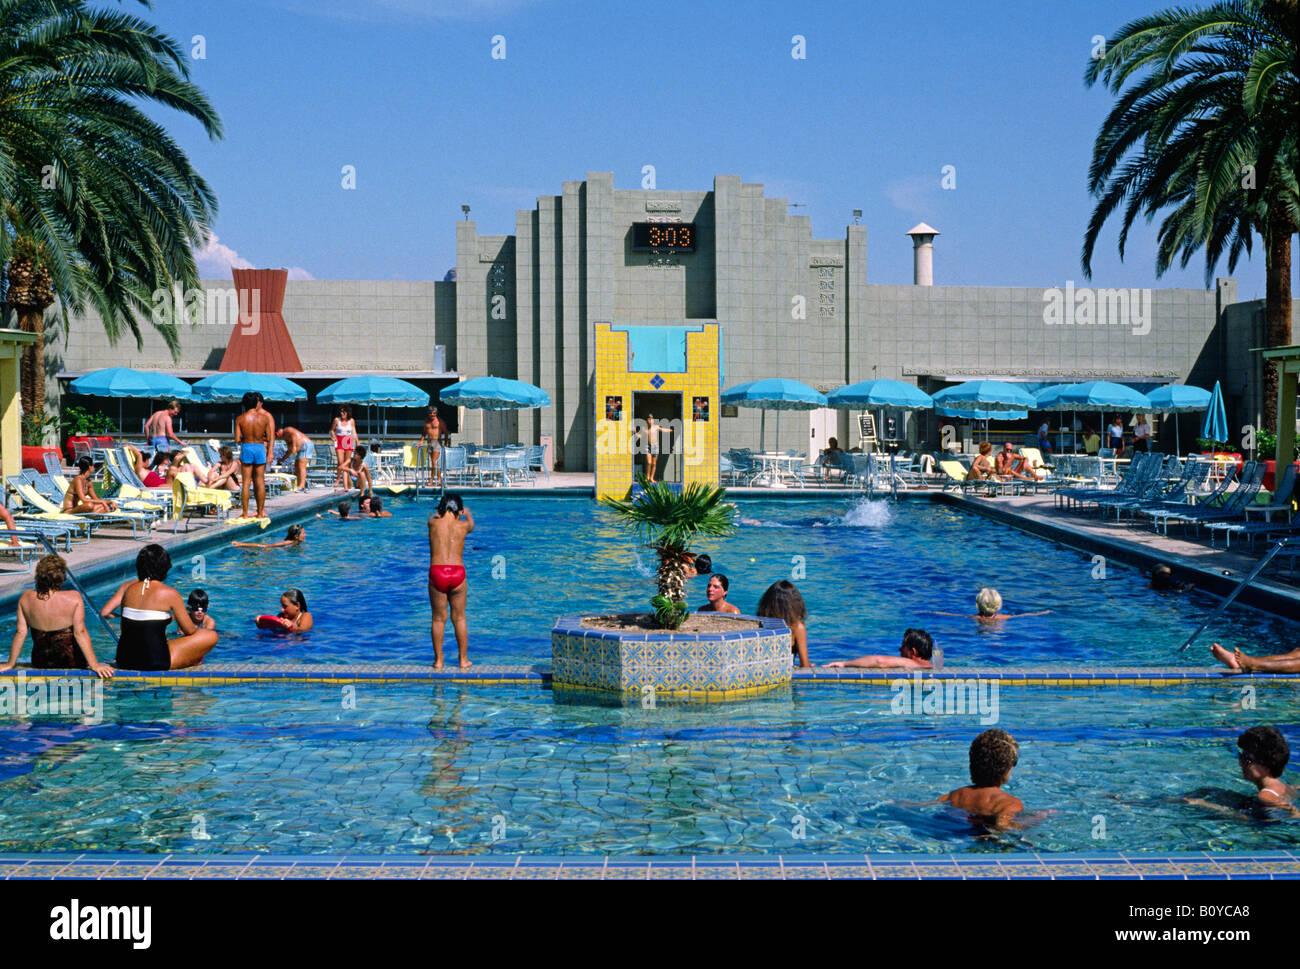 swimming pool united states arizona stock photos swimming pool united states arizona stock